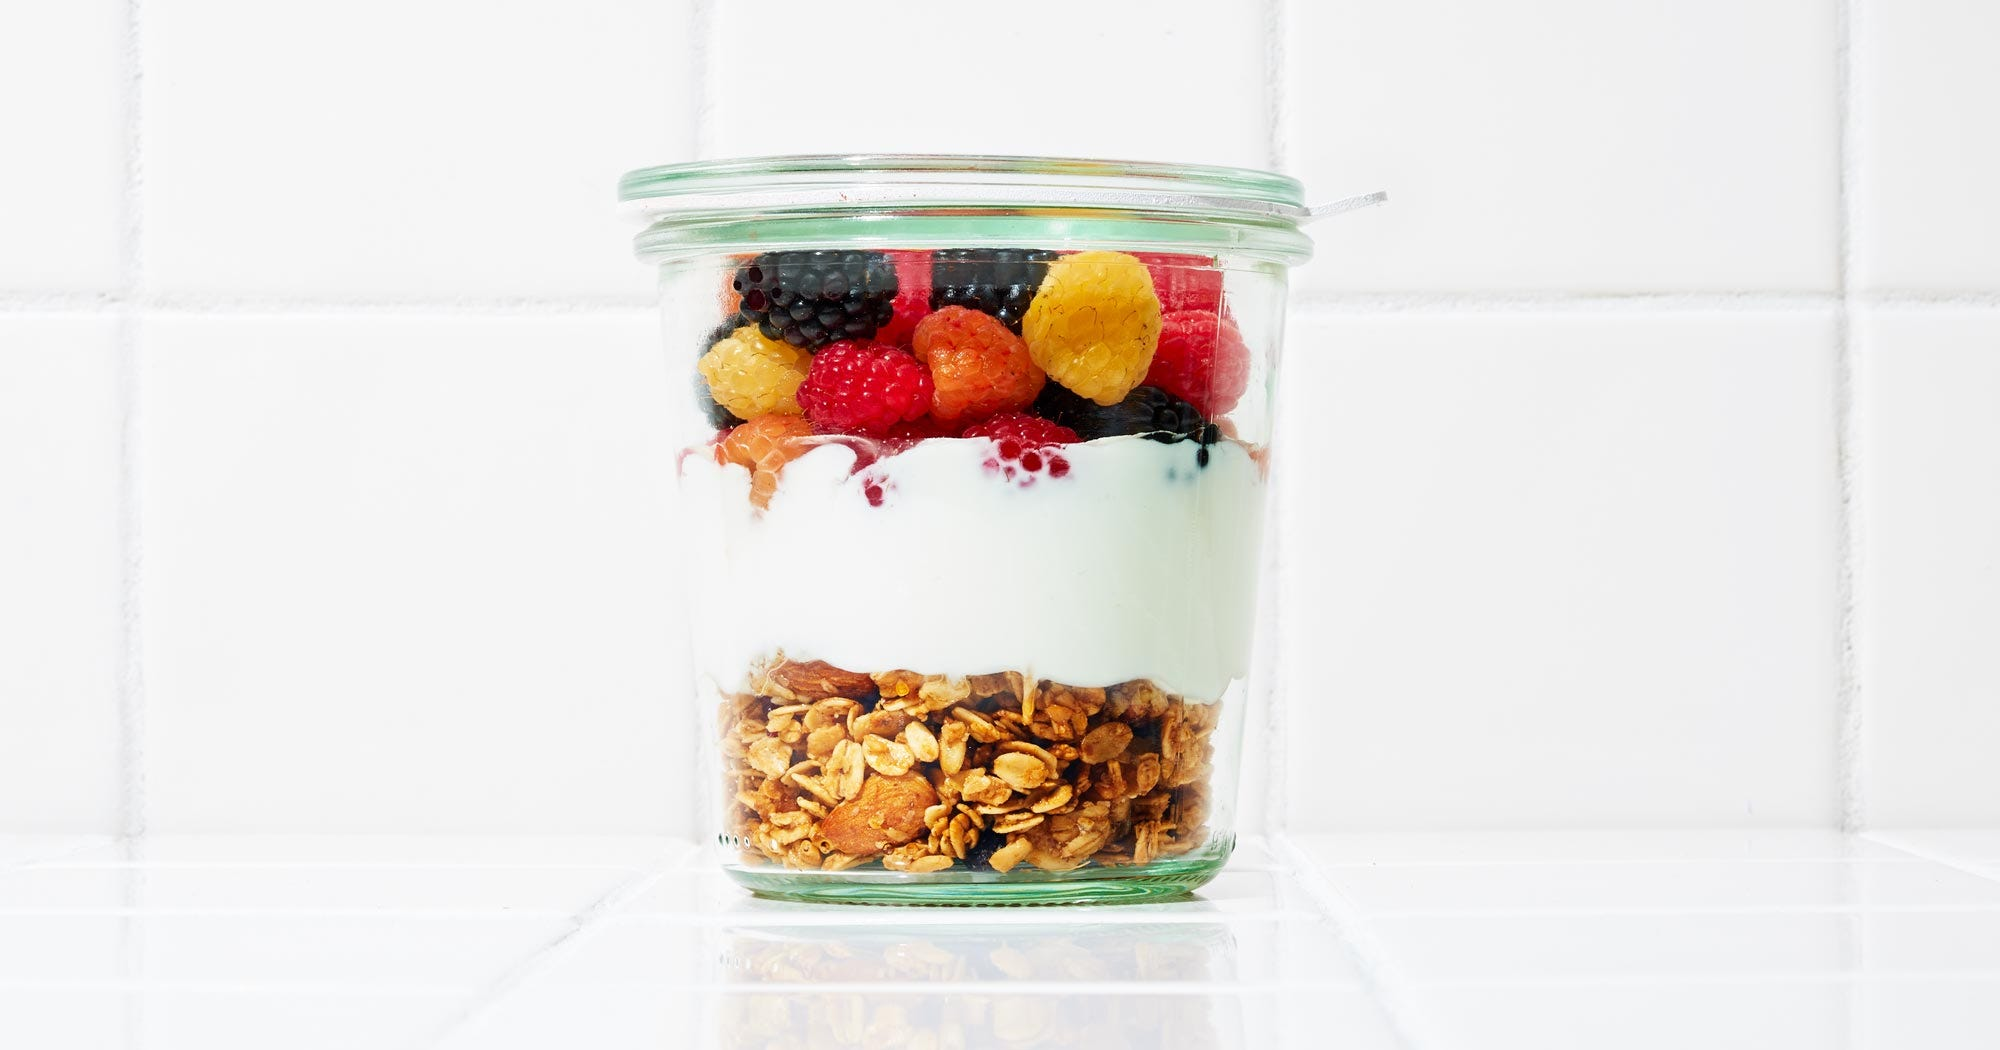 5 Fast & Fresh No-Cook Summer Breakfasts